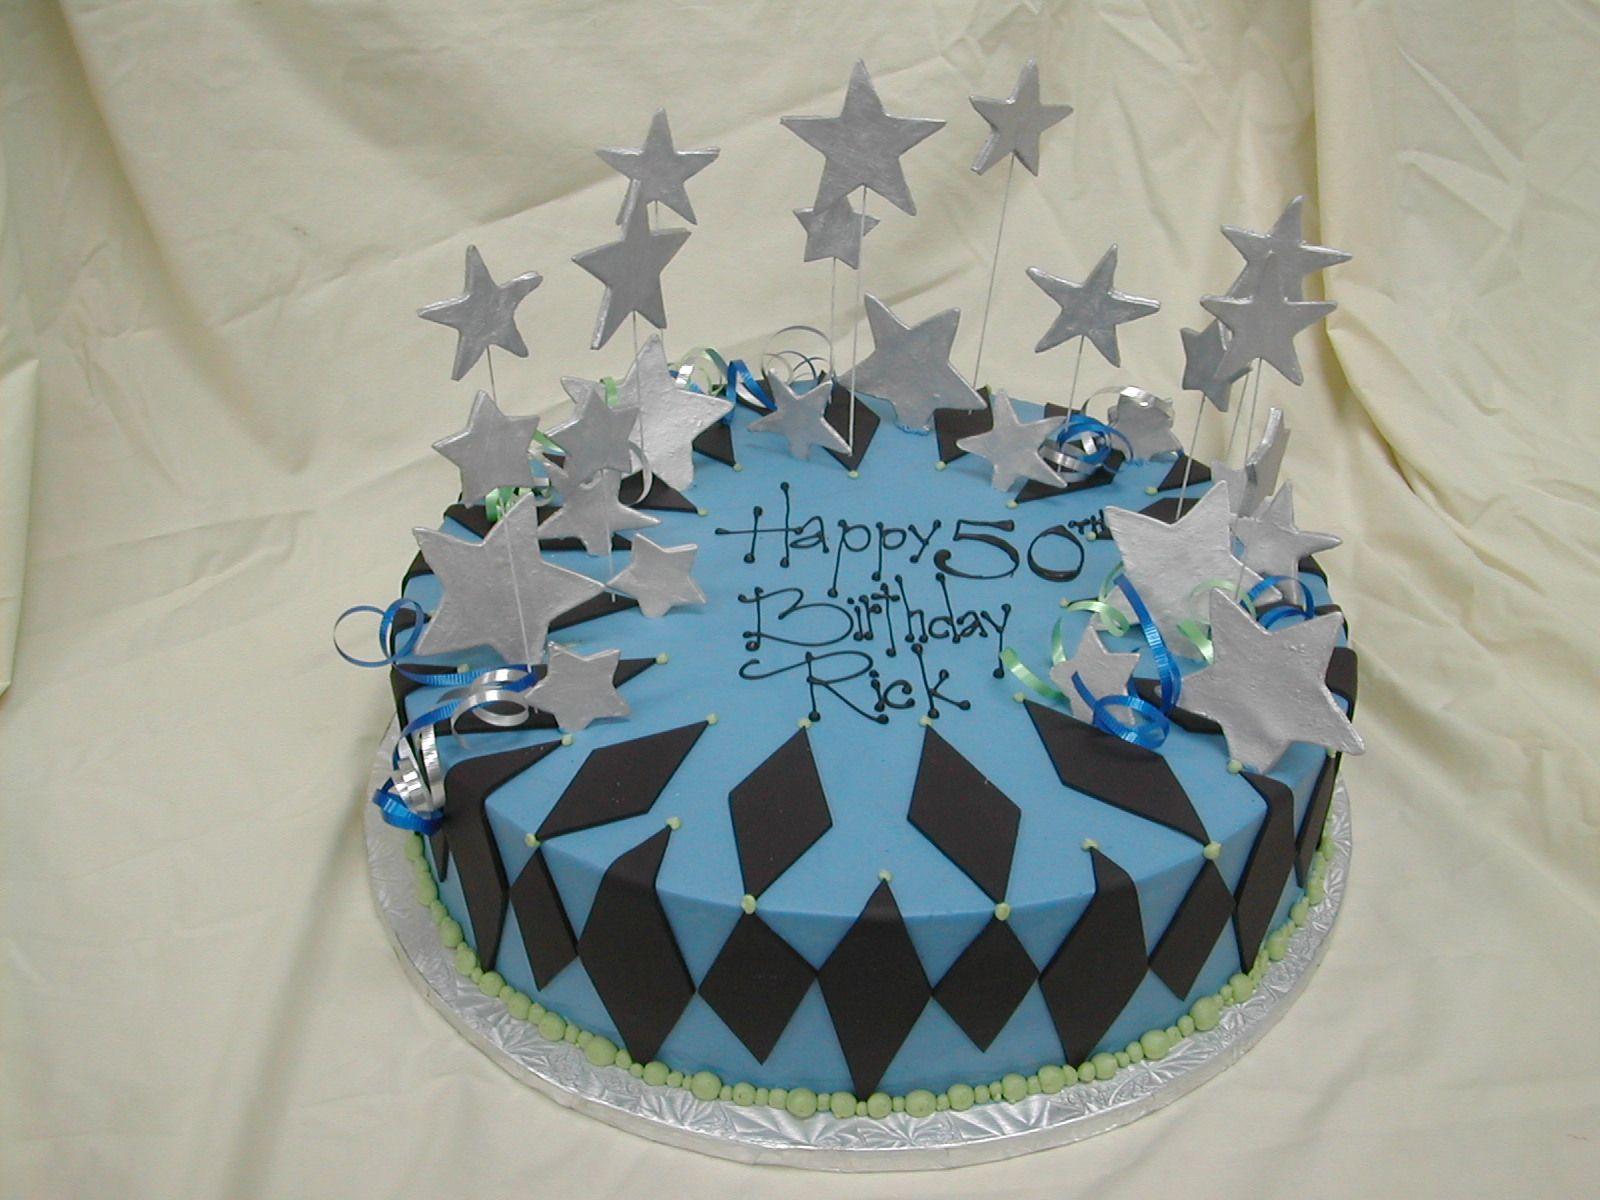 40th Birthday Party Ideas for Men | Dessert Works Bakery: 40th Birthday Ideas!